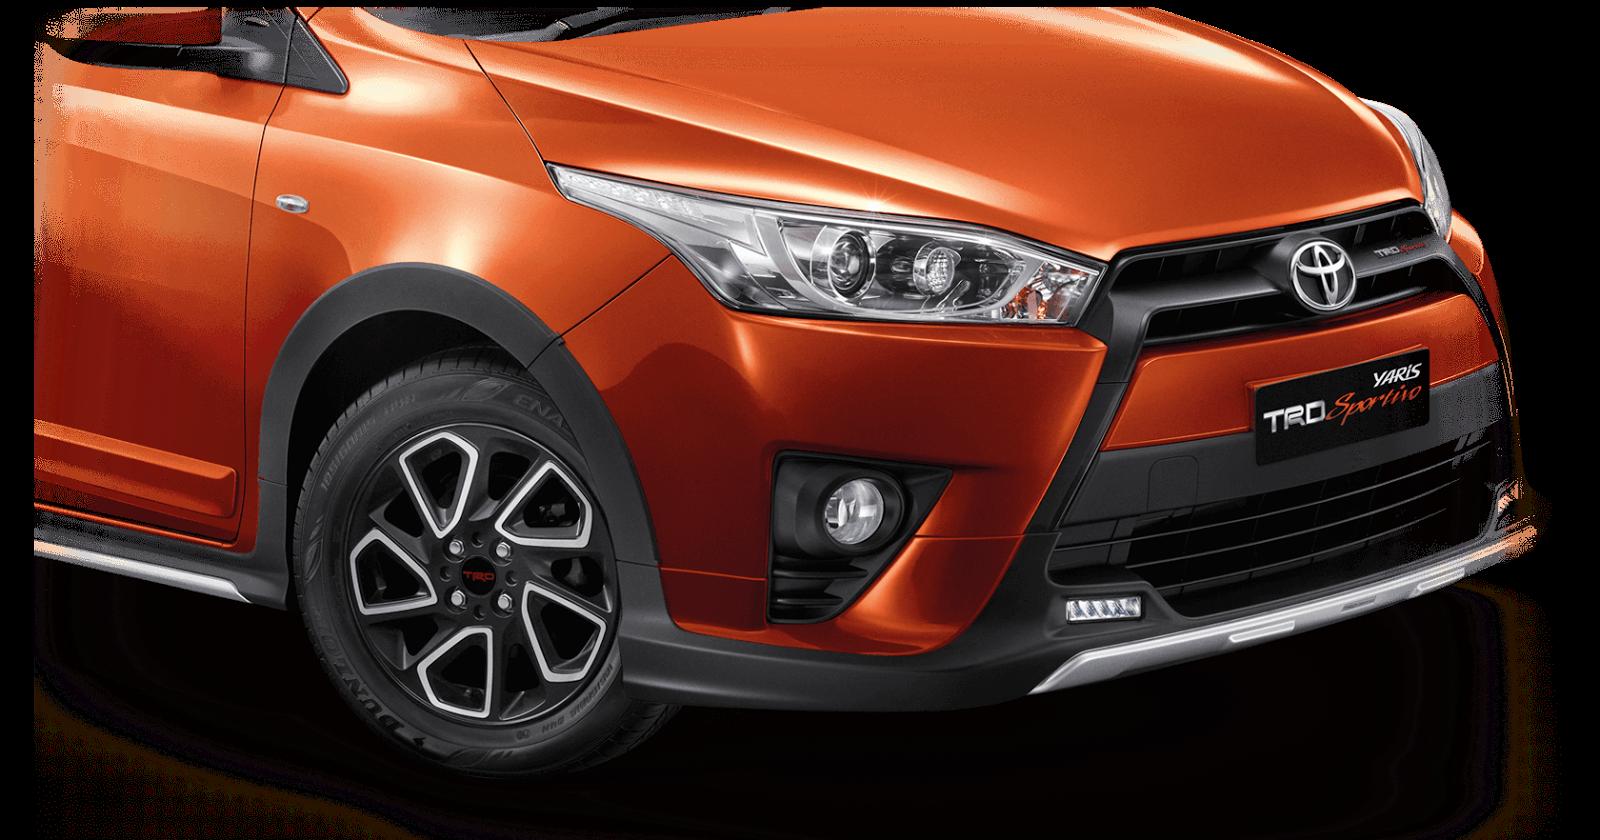 Harga New Yaris Trd Sportivo 2018 Kompresi Grand Avanza 2016 Car News Update Toyota ปรบเตม